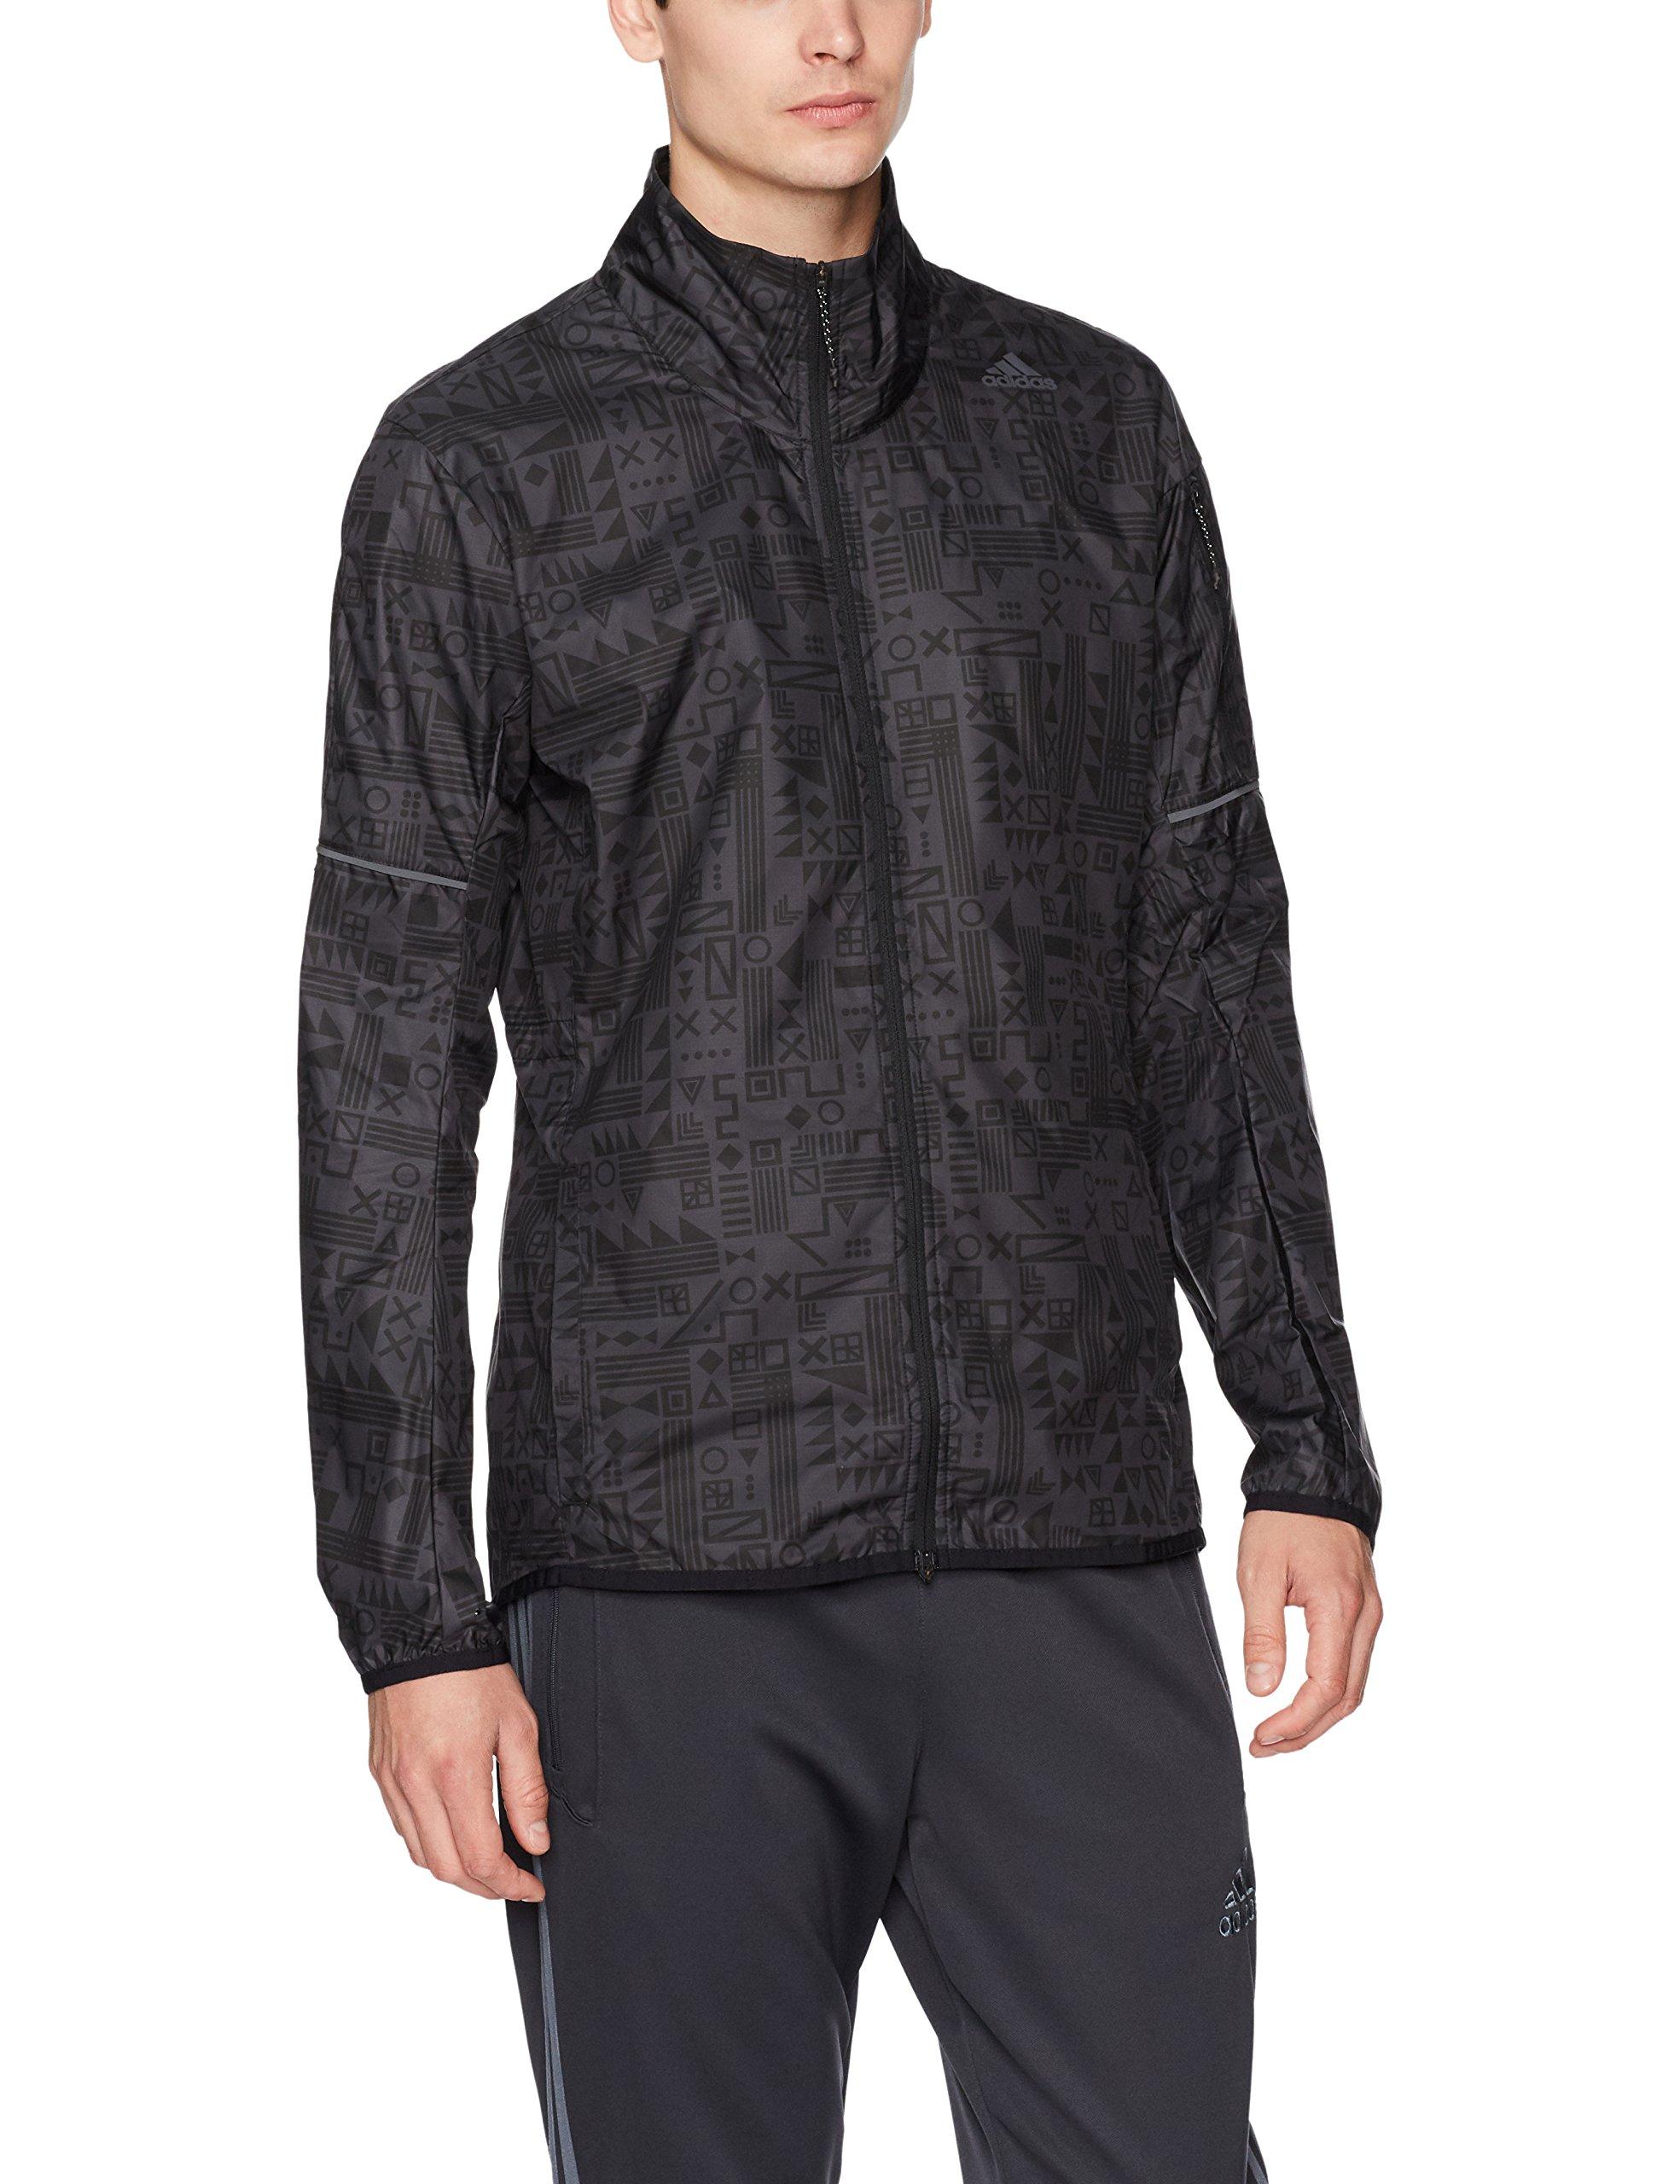 adidas Men's Running Supernova Tokyo Jacket, Black/Utility Black, Medium by adidas (Image #1)